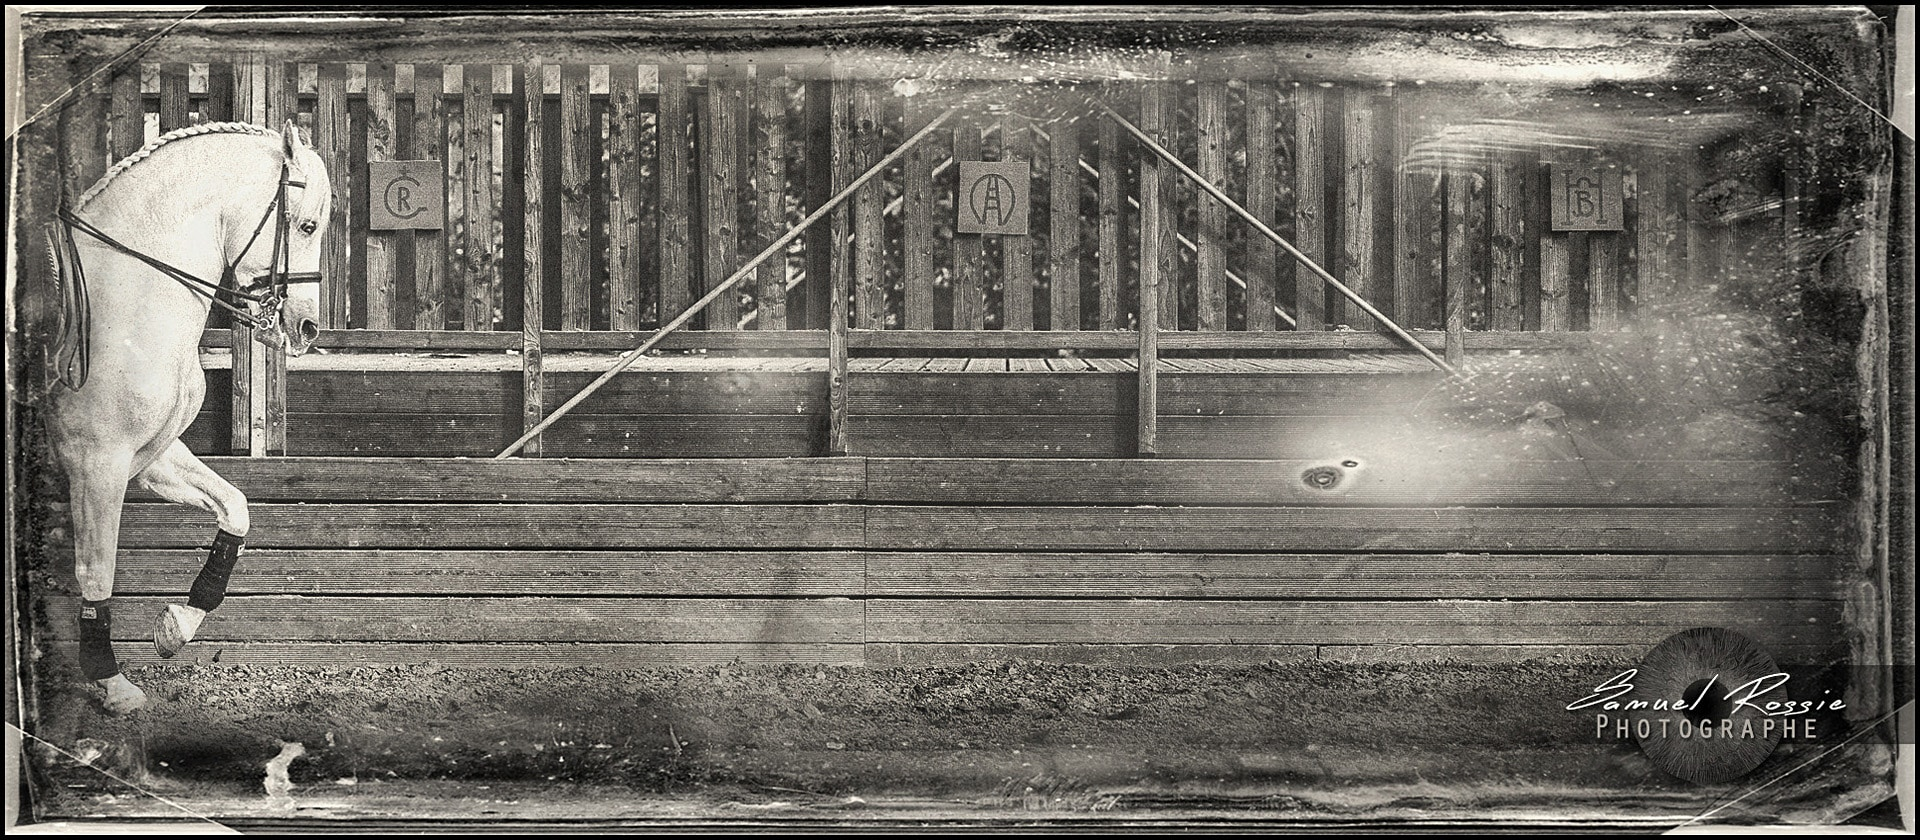 Orangerie00004-1920Px